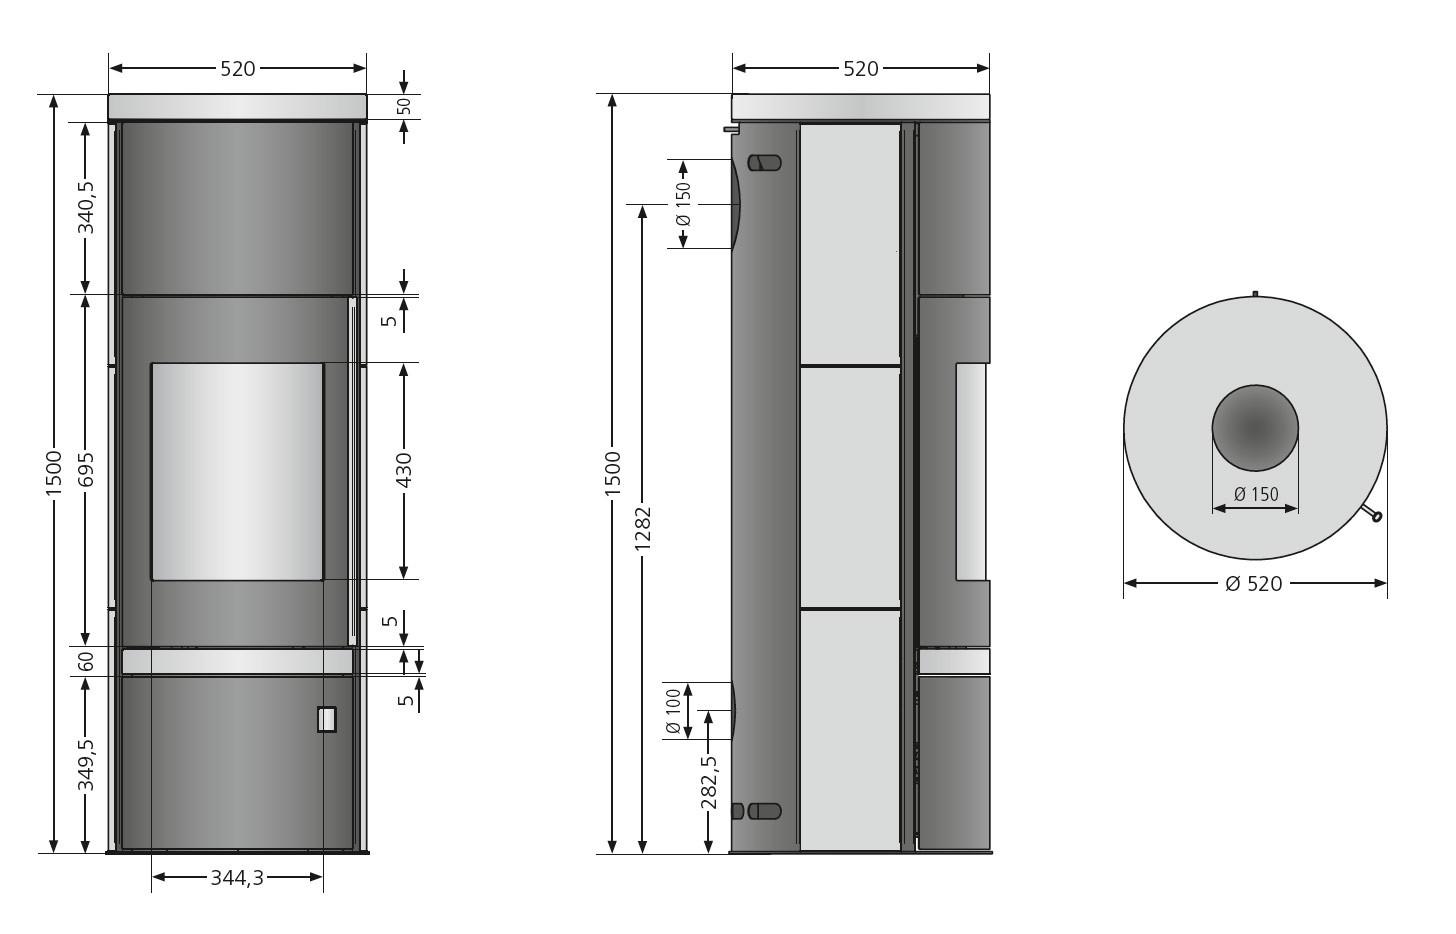 kaminofen justus faro w raumluftunabh ngig schwarz stahl 7 kw bei. Black Bedroom Furniture Sets. Home Design Ideas